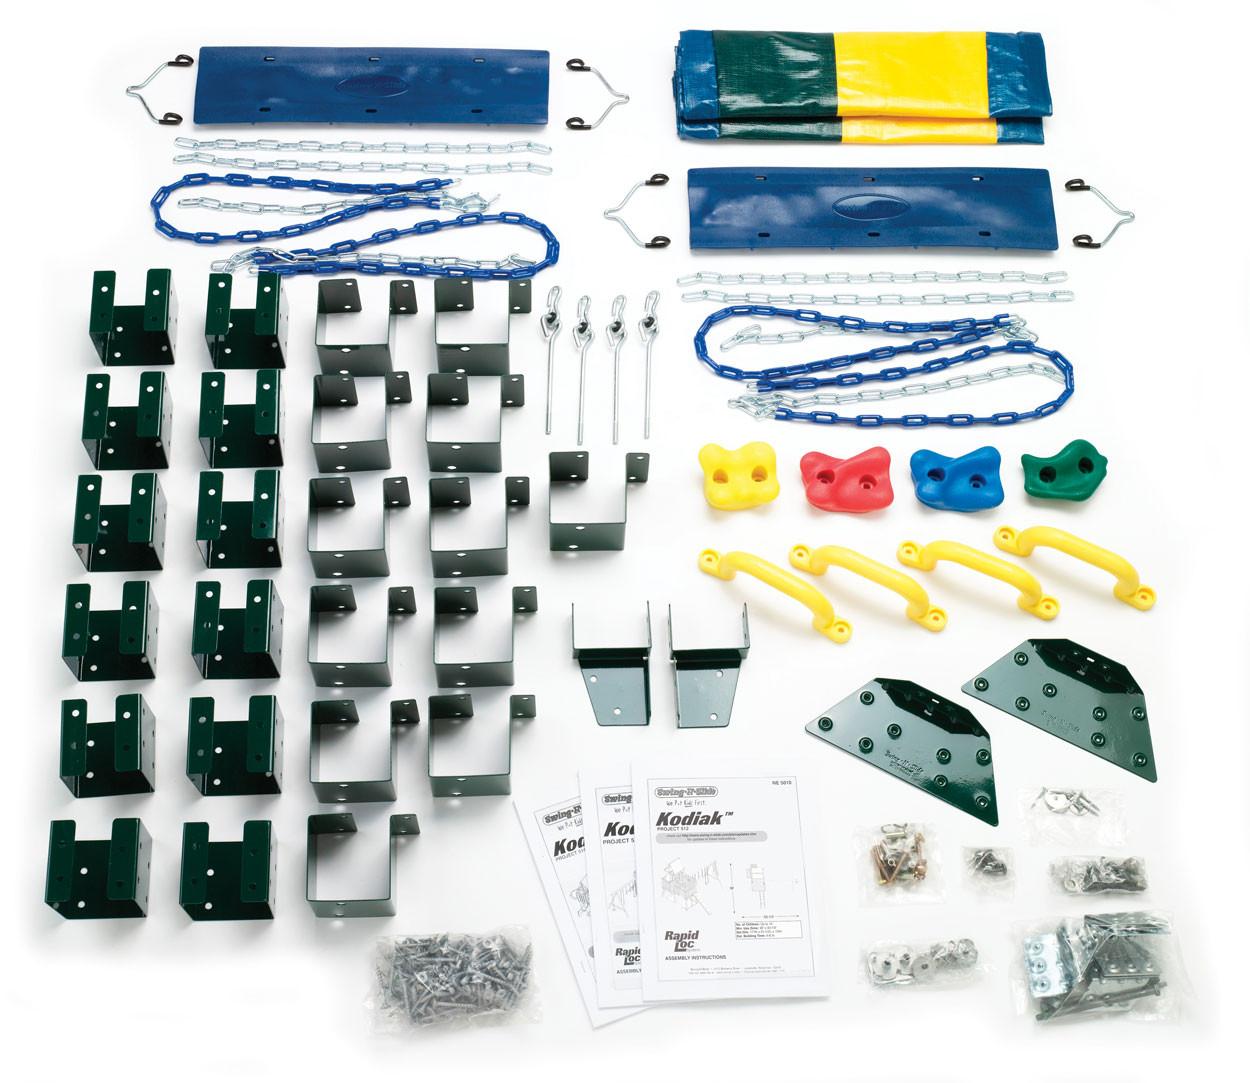 Kodiak Swing Set Kit Contents